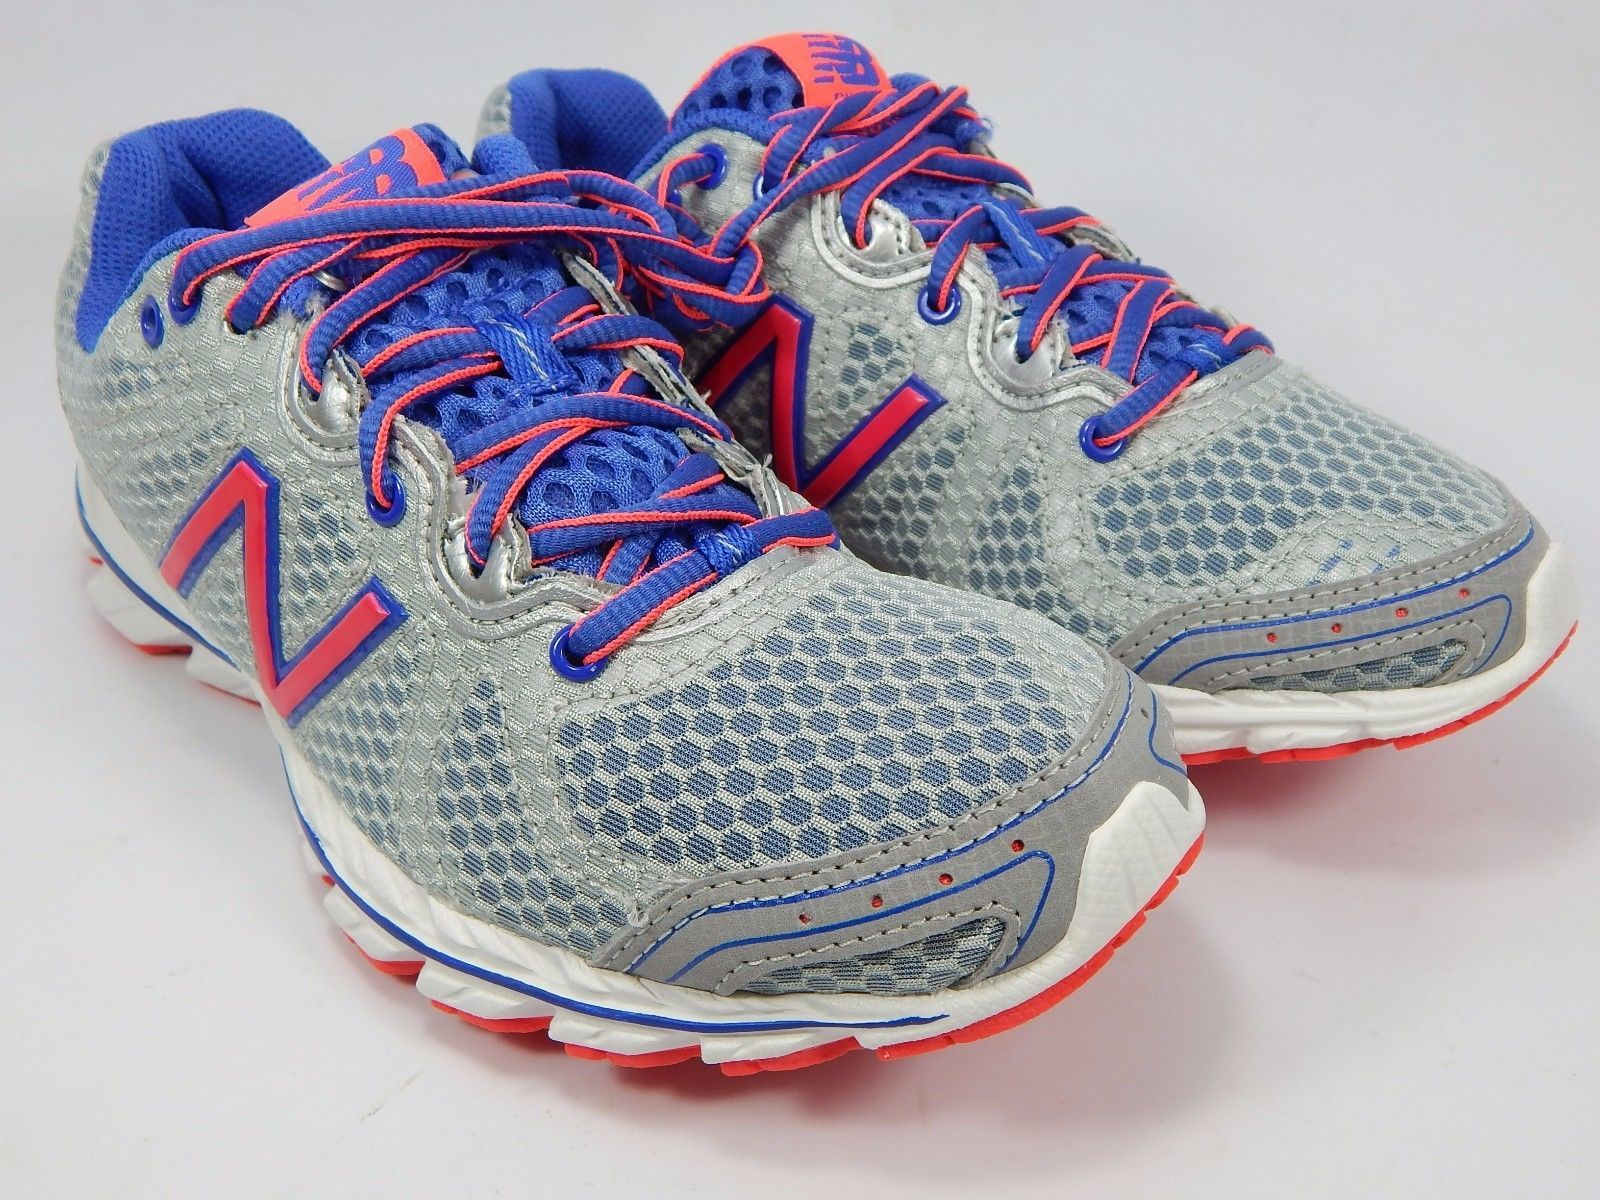 New Balance 590 v2 Women's Running Shoes Size US 6 M (B) EU 36.5 Silver W590SB2